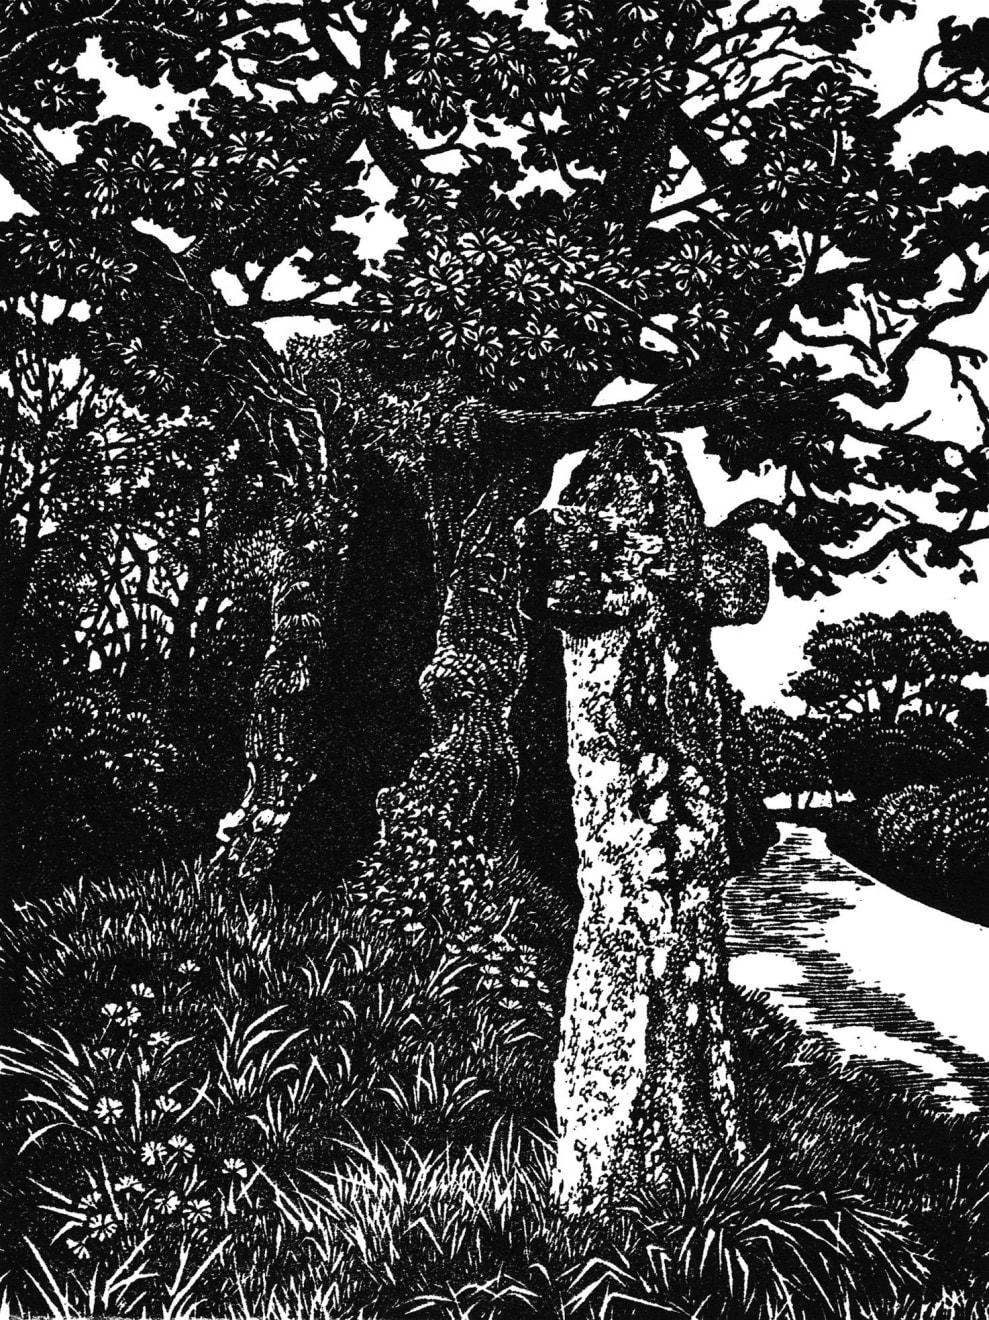 Summer Auction 2020, LOT 37 - Blaze Cyan - 'Stumpy Oak at Hawson's Cross', 2020